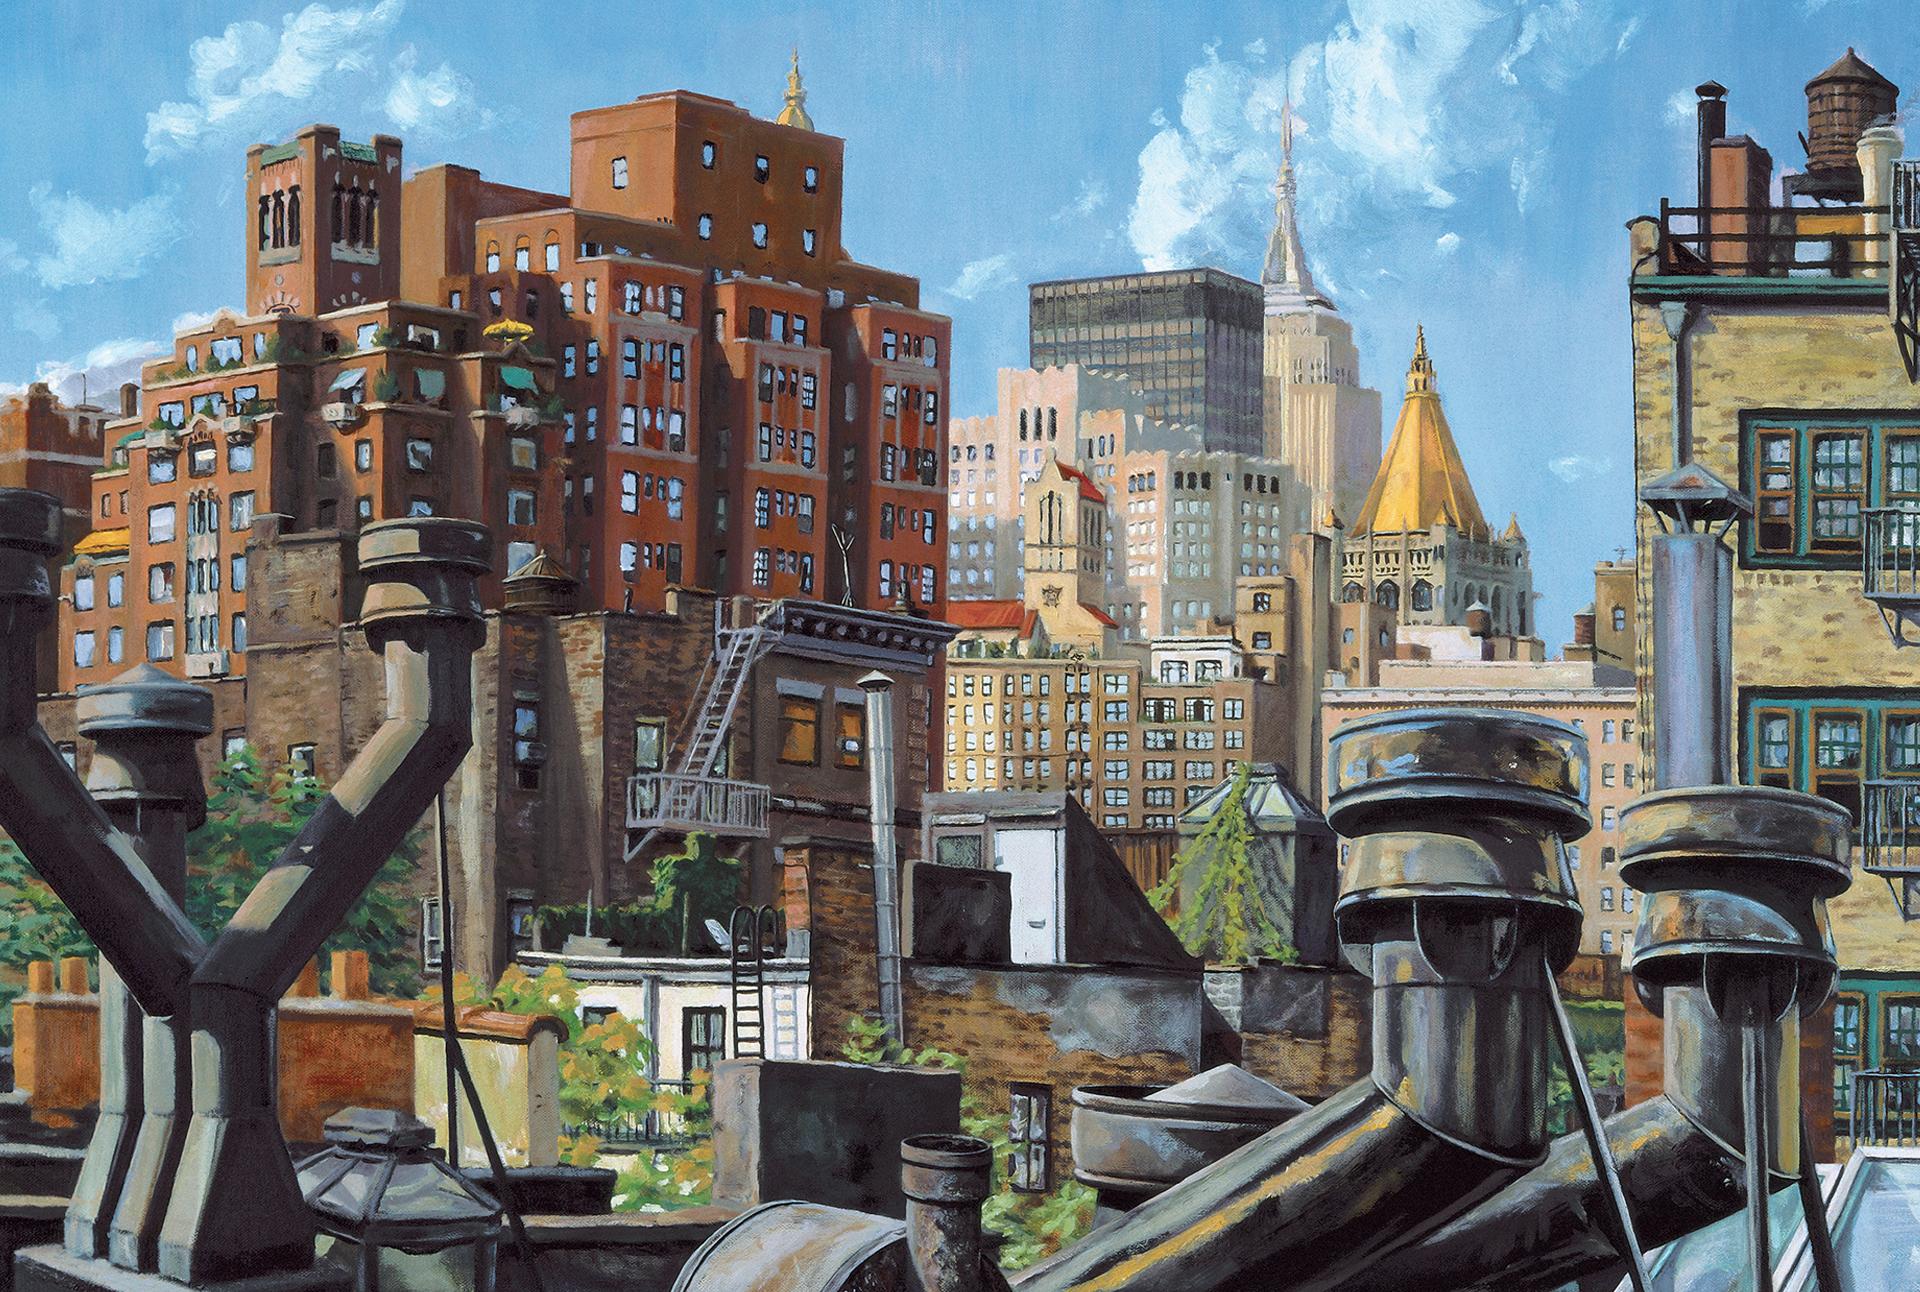 CITYSCAPES TITLE